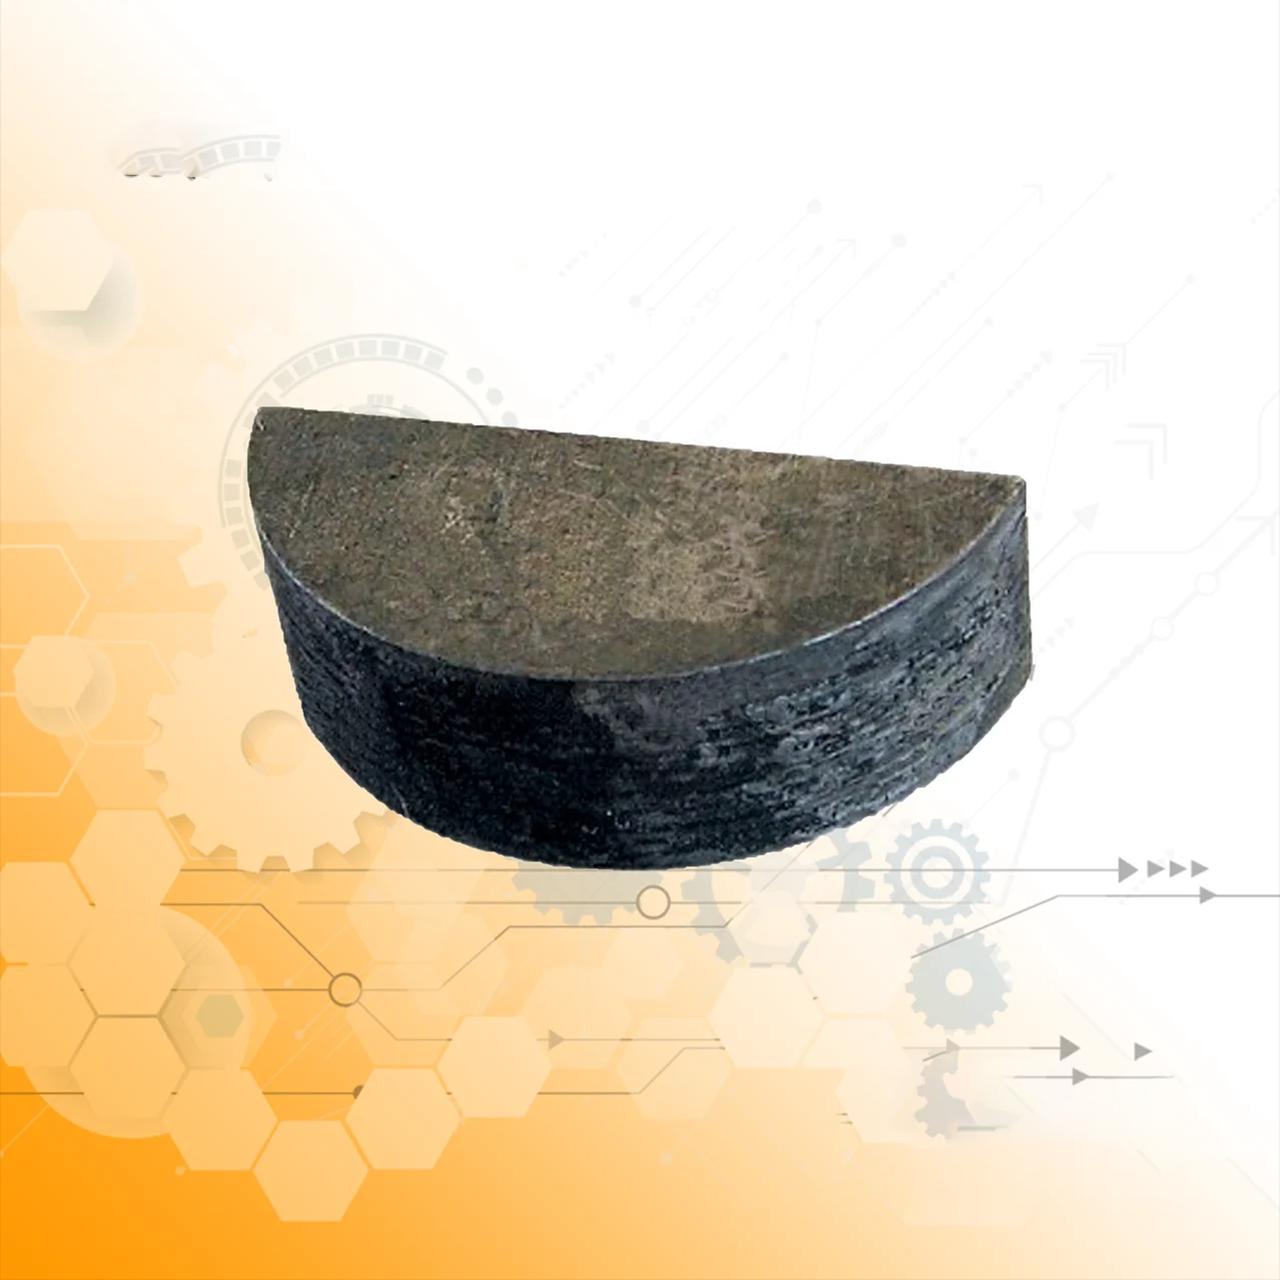 Шпонка сегментная ЯМЗ 314006-П